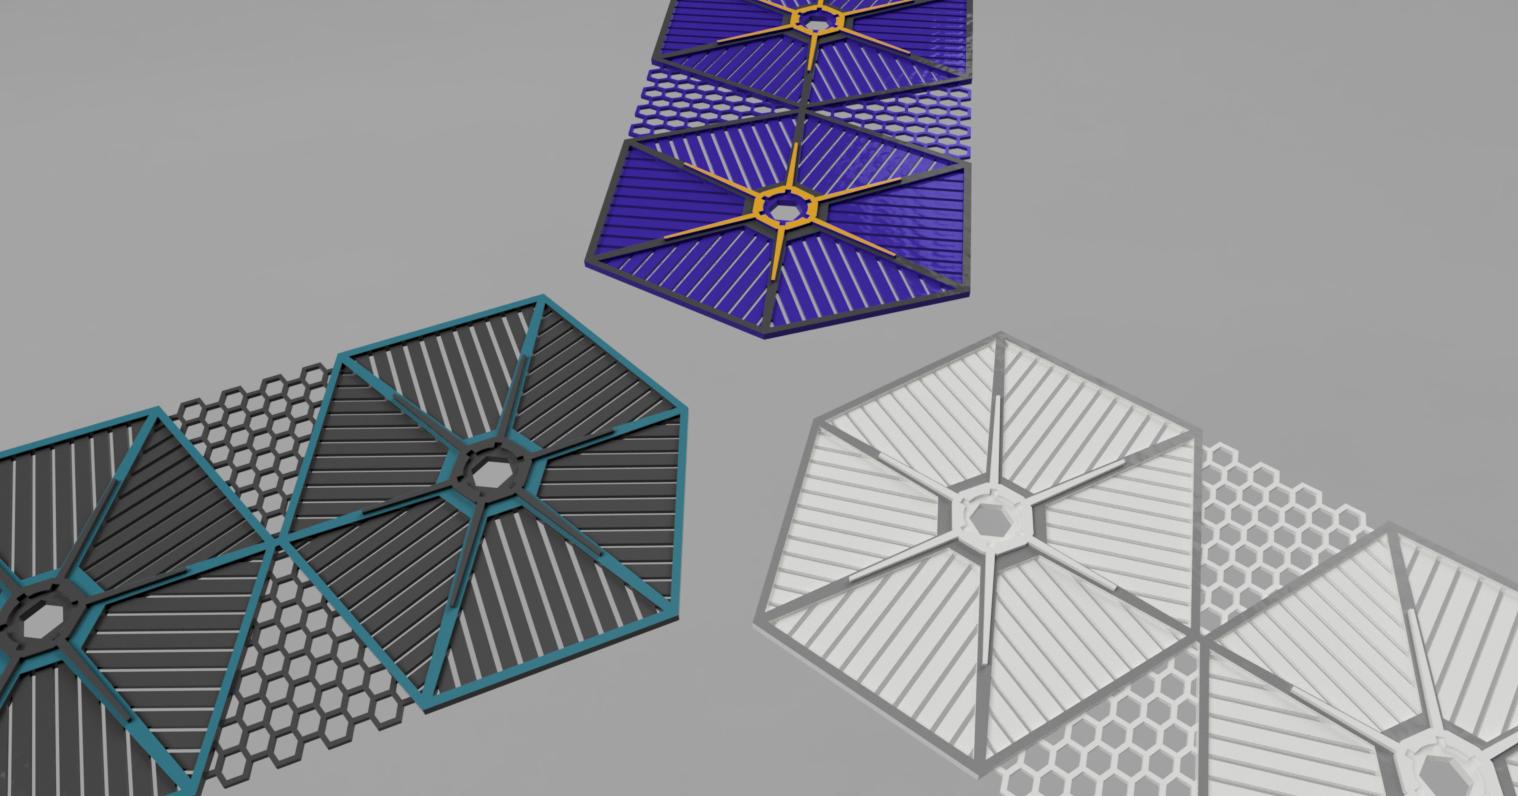 3_styles.png Download STL file TIE Fighter Bathroom Shelf • 3D printer model, AdditivedIndDesigns